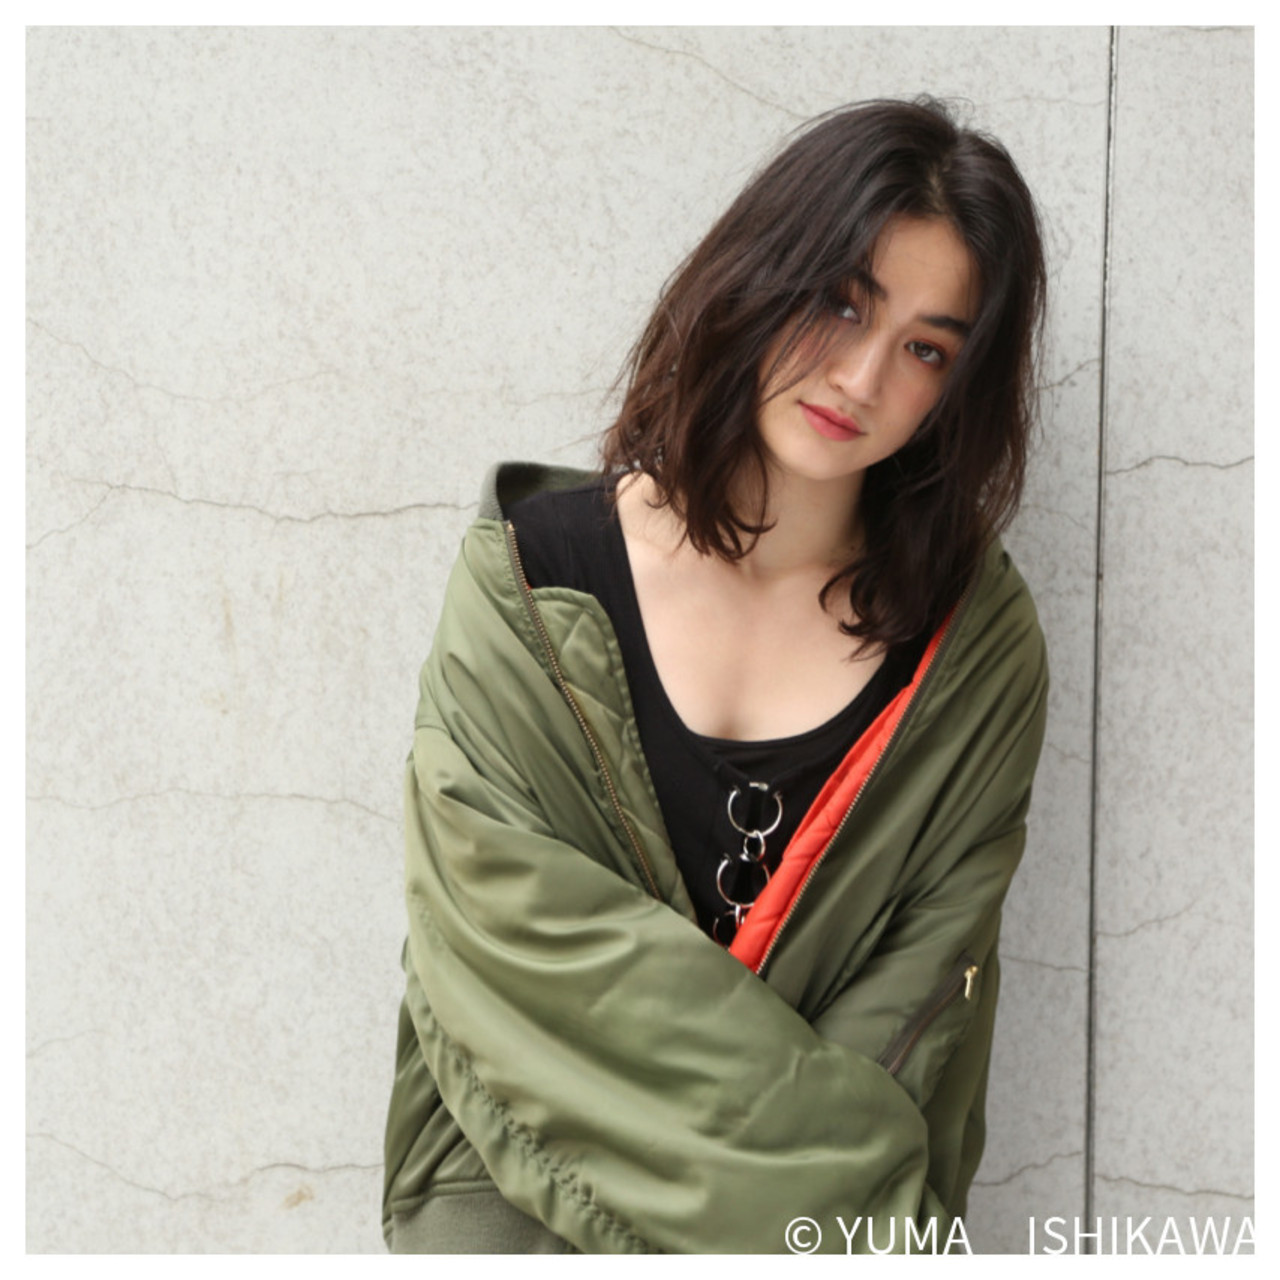 https://hair.cm/stylist-yumaishikawa/